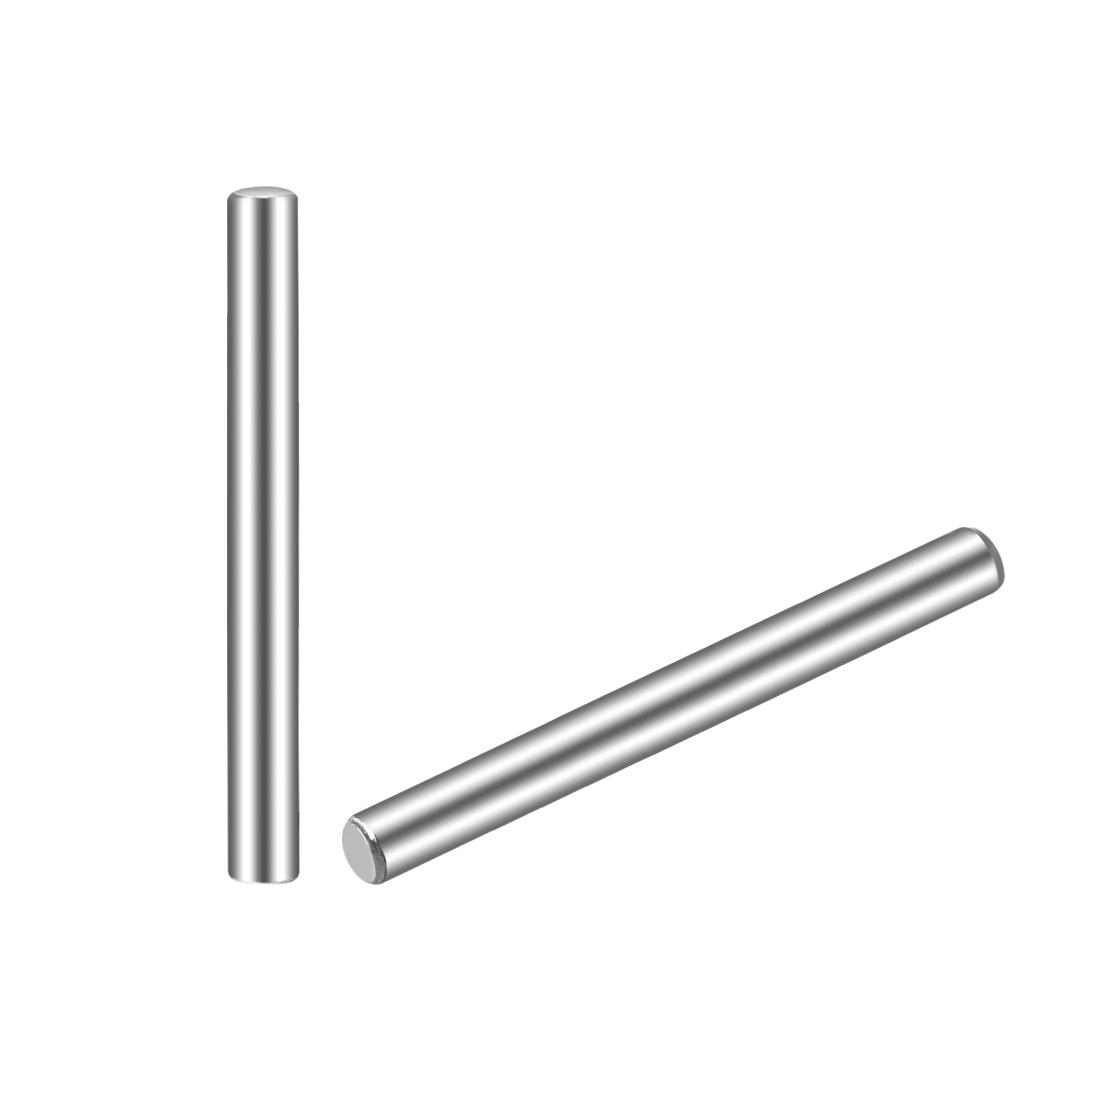 30Pcs 2.5mm x 25mm Dowel Pin 304 Stainless Steel Shelf Support Pin Fasten